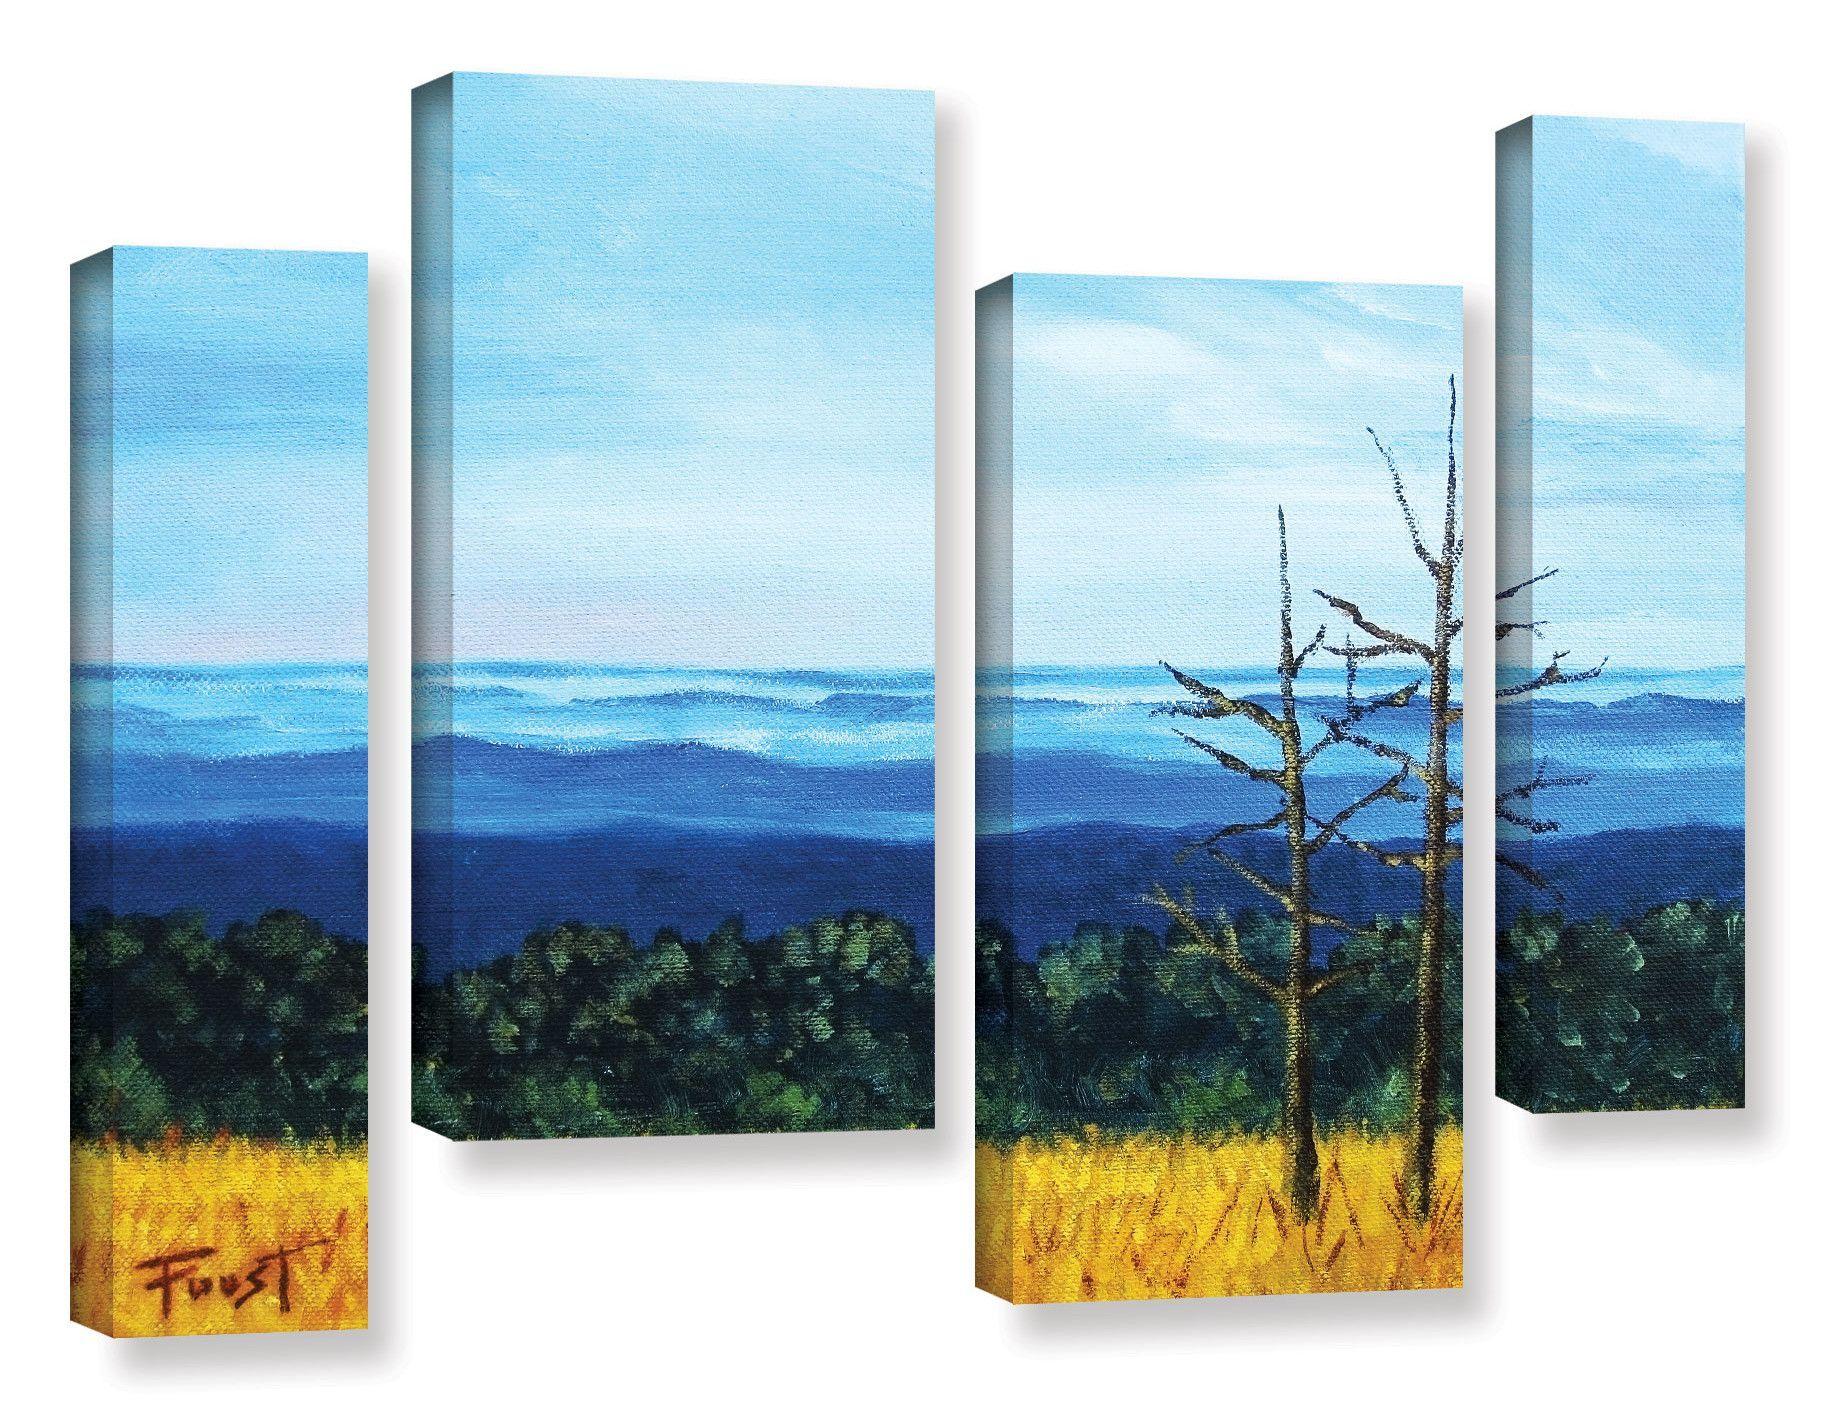 24 x 36 ArtWall 4 Piece Steve Ainsworths Still Waters Floater Framed Canvas Staggered Set